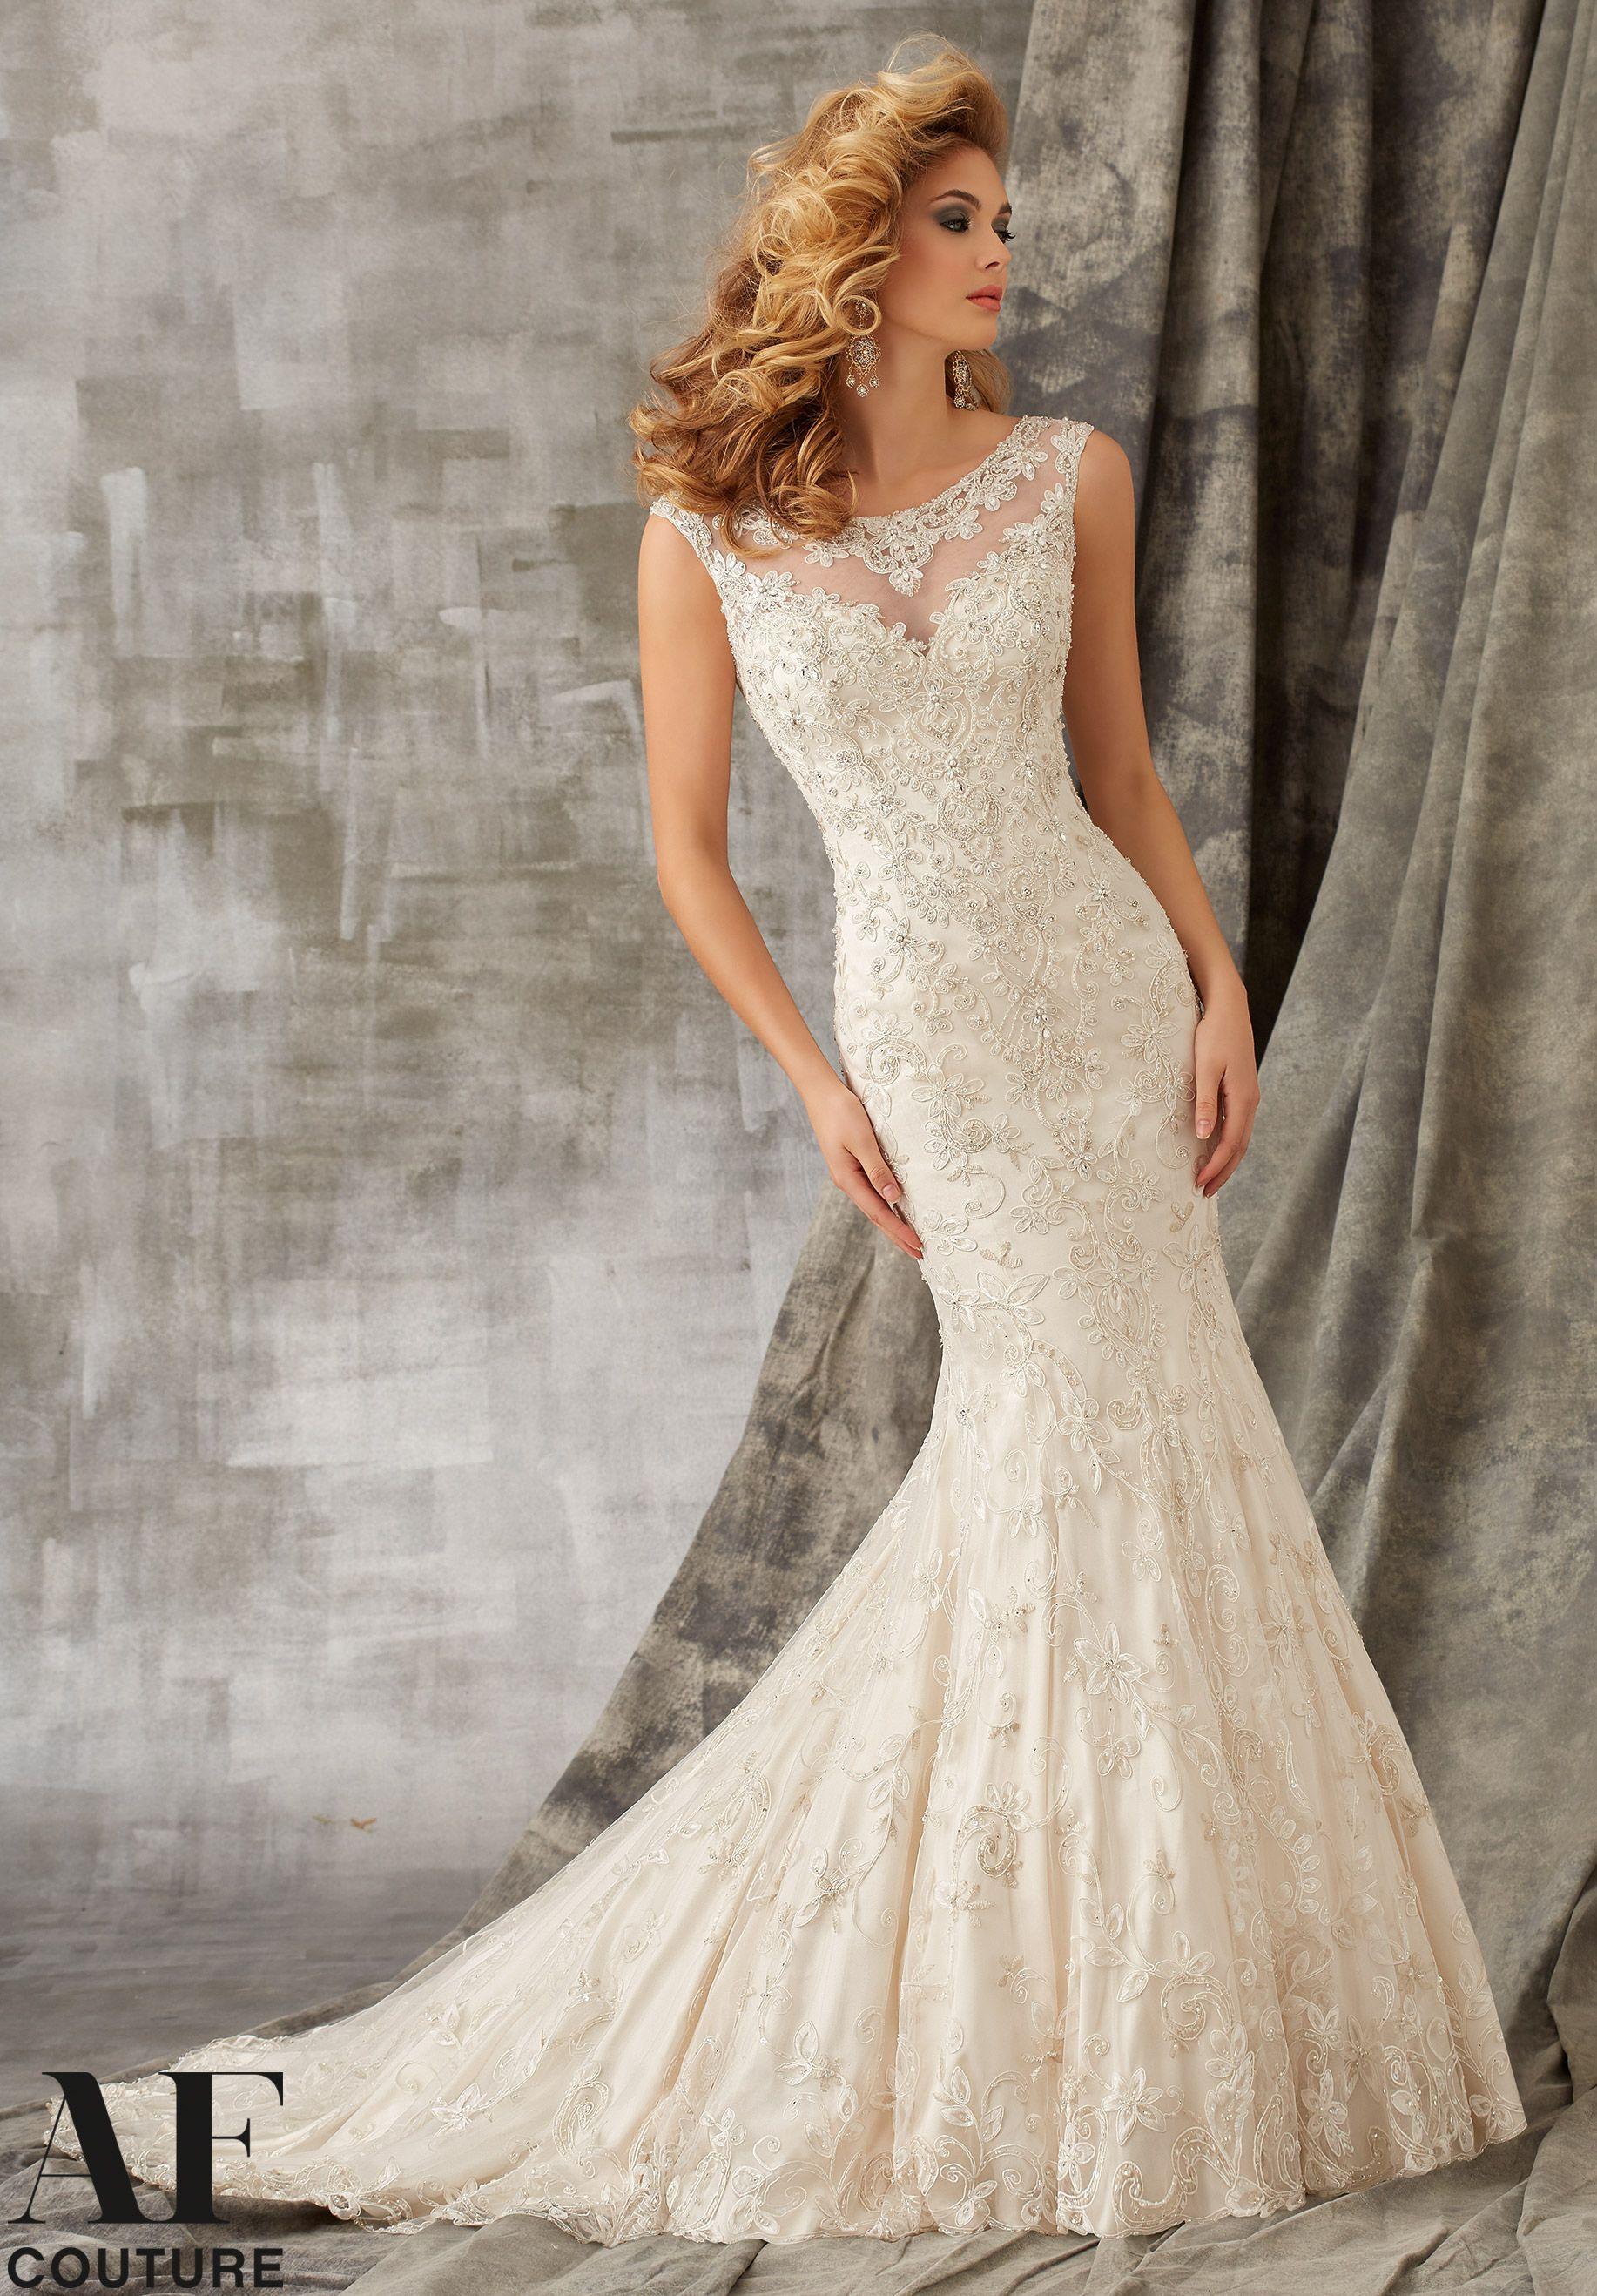 Wedding Dresses For Over 55 : Wedding dresses dress styles garden weddings gowns